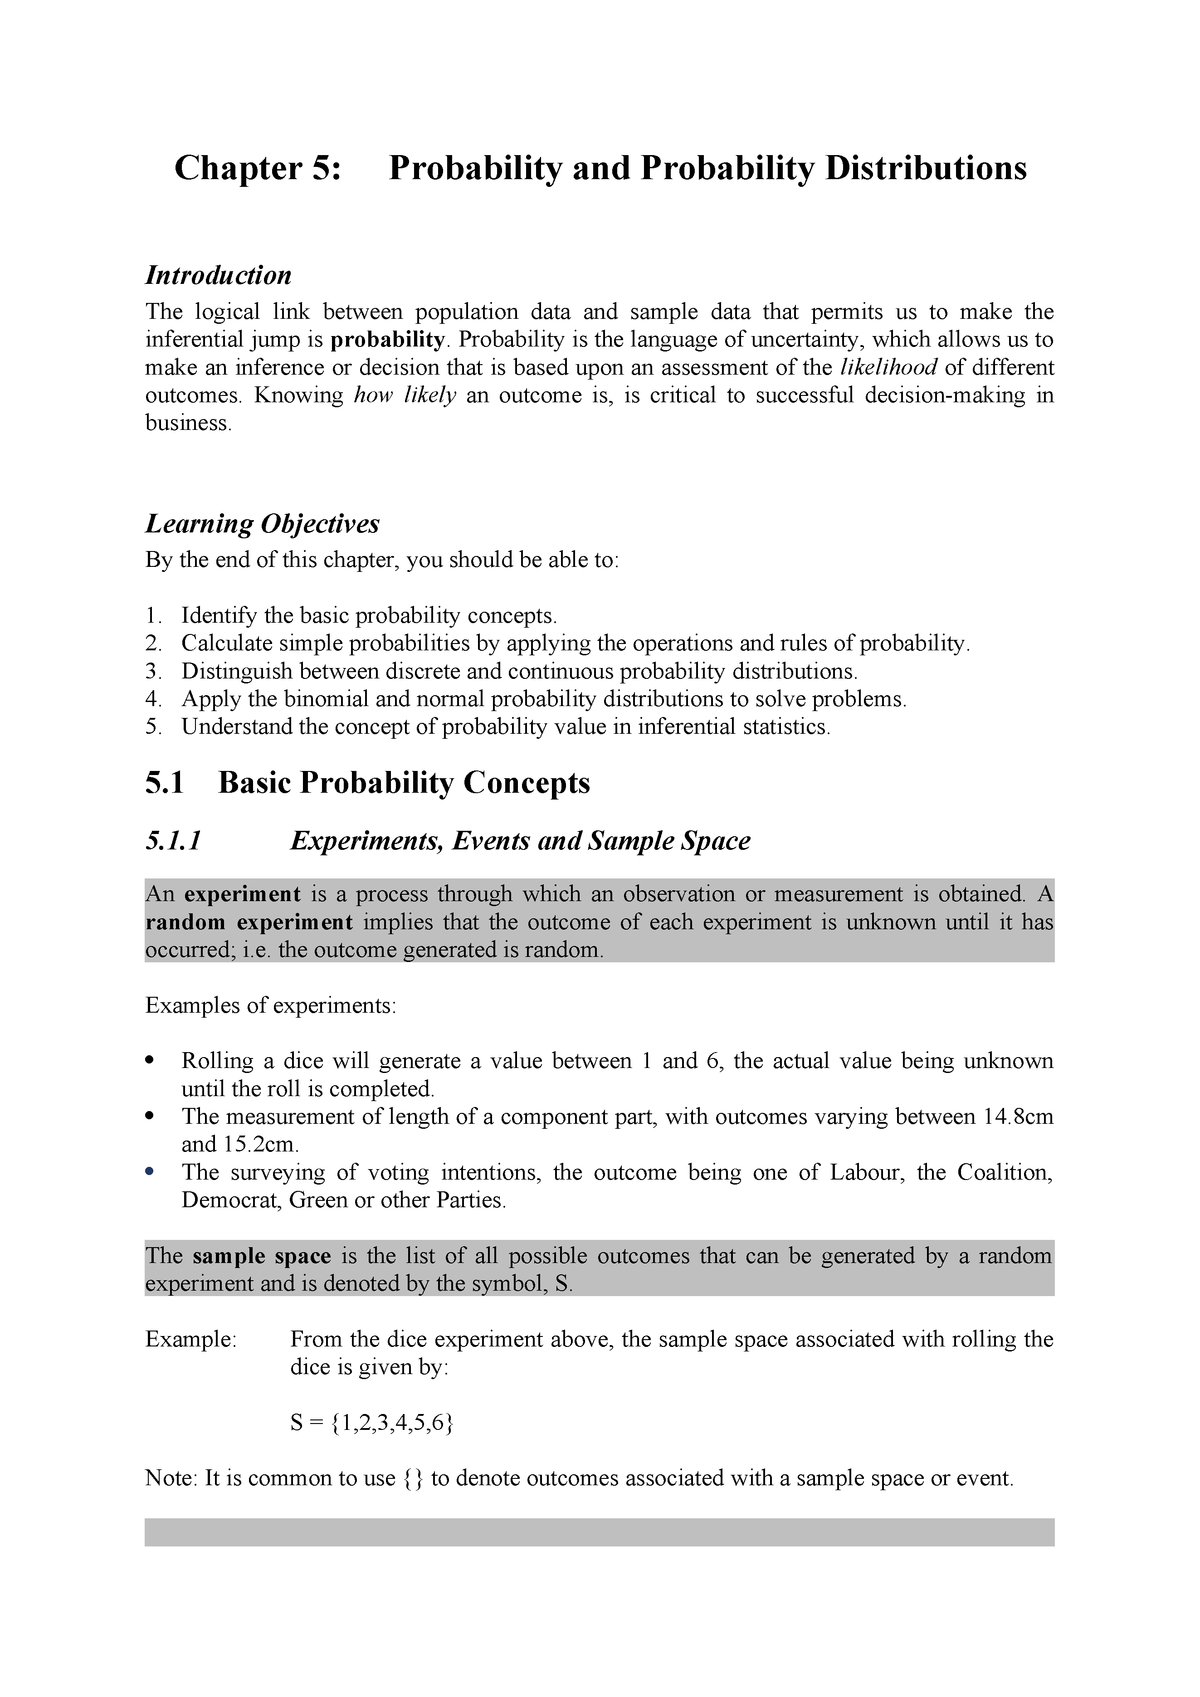 Week 4 Reading - Week 4 Summary - Data Analysis BSB123 - StuDocu